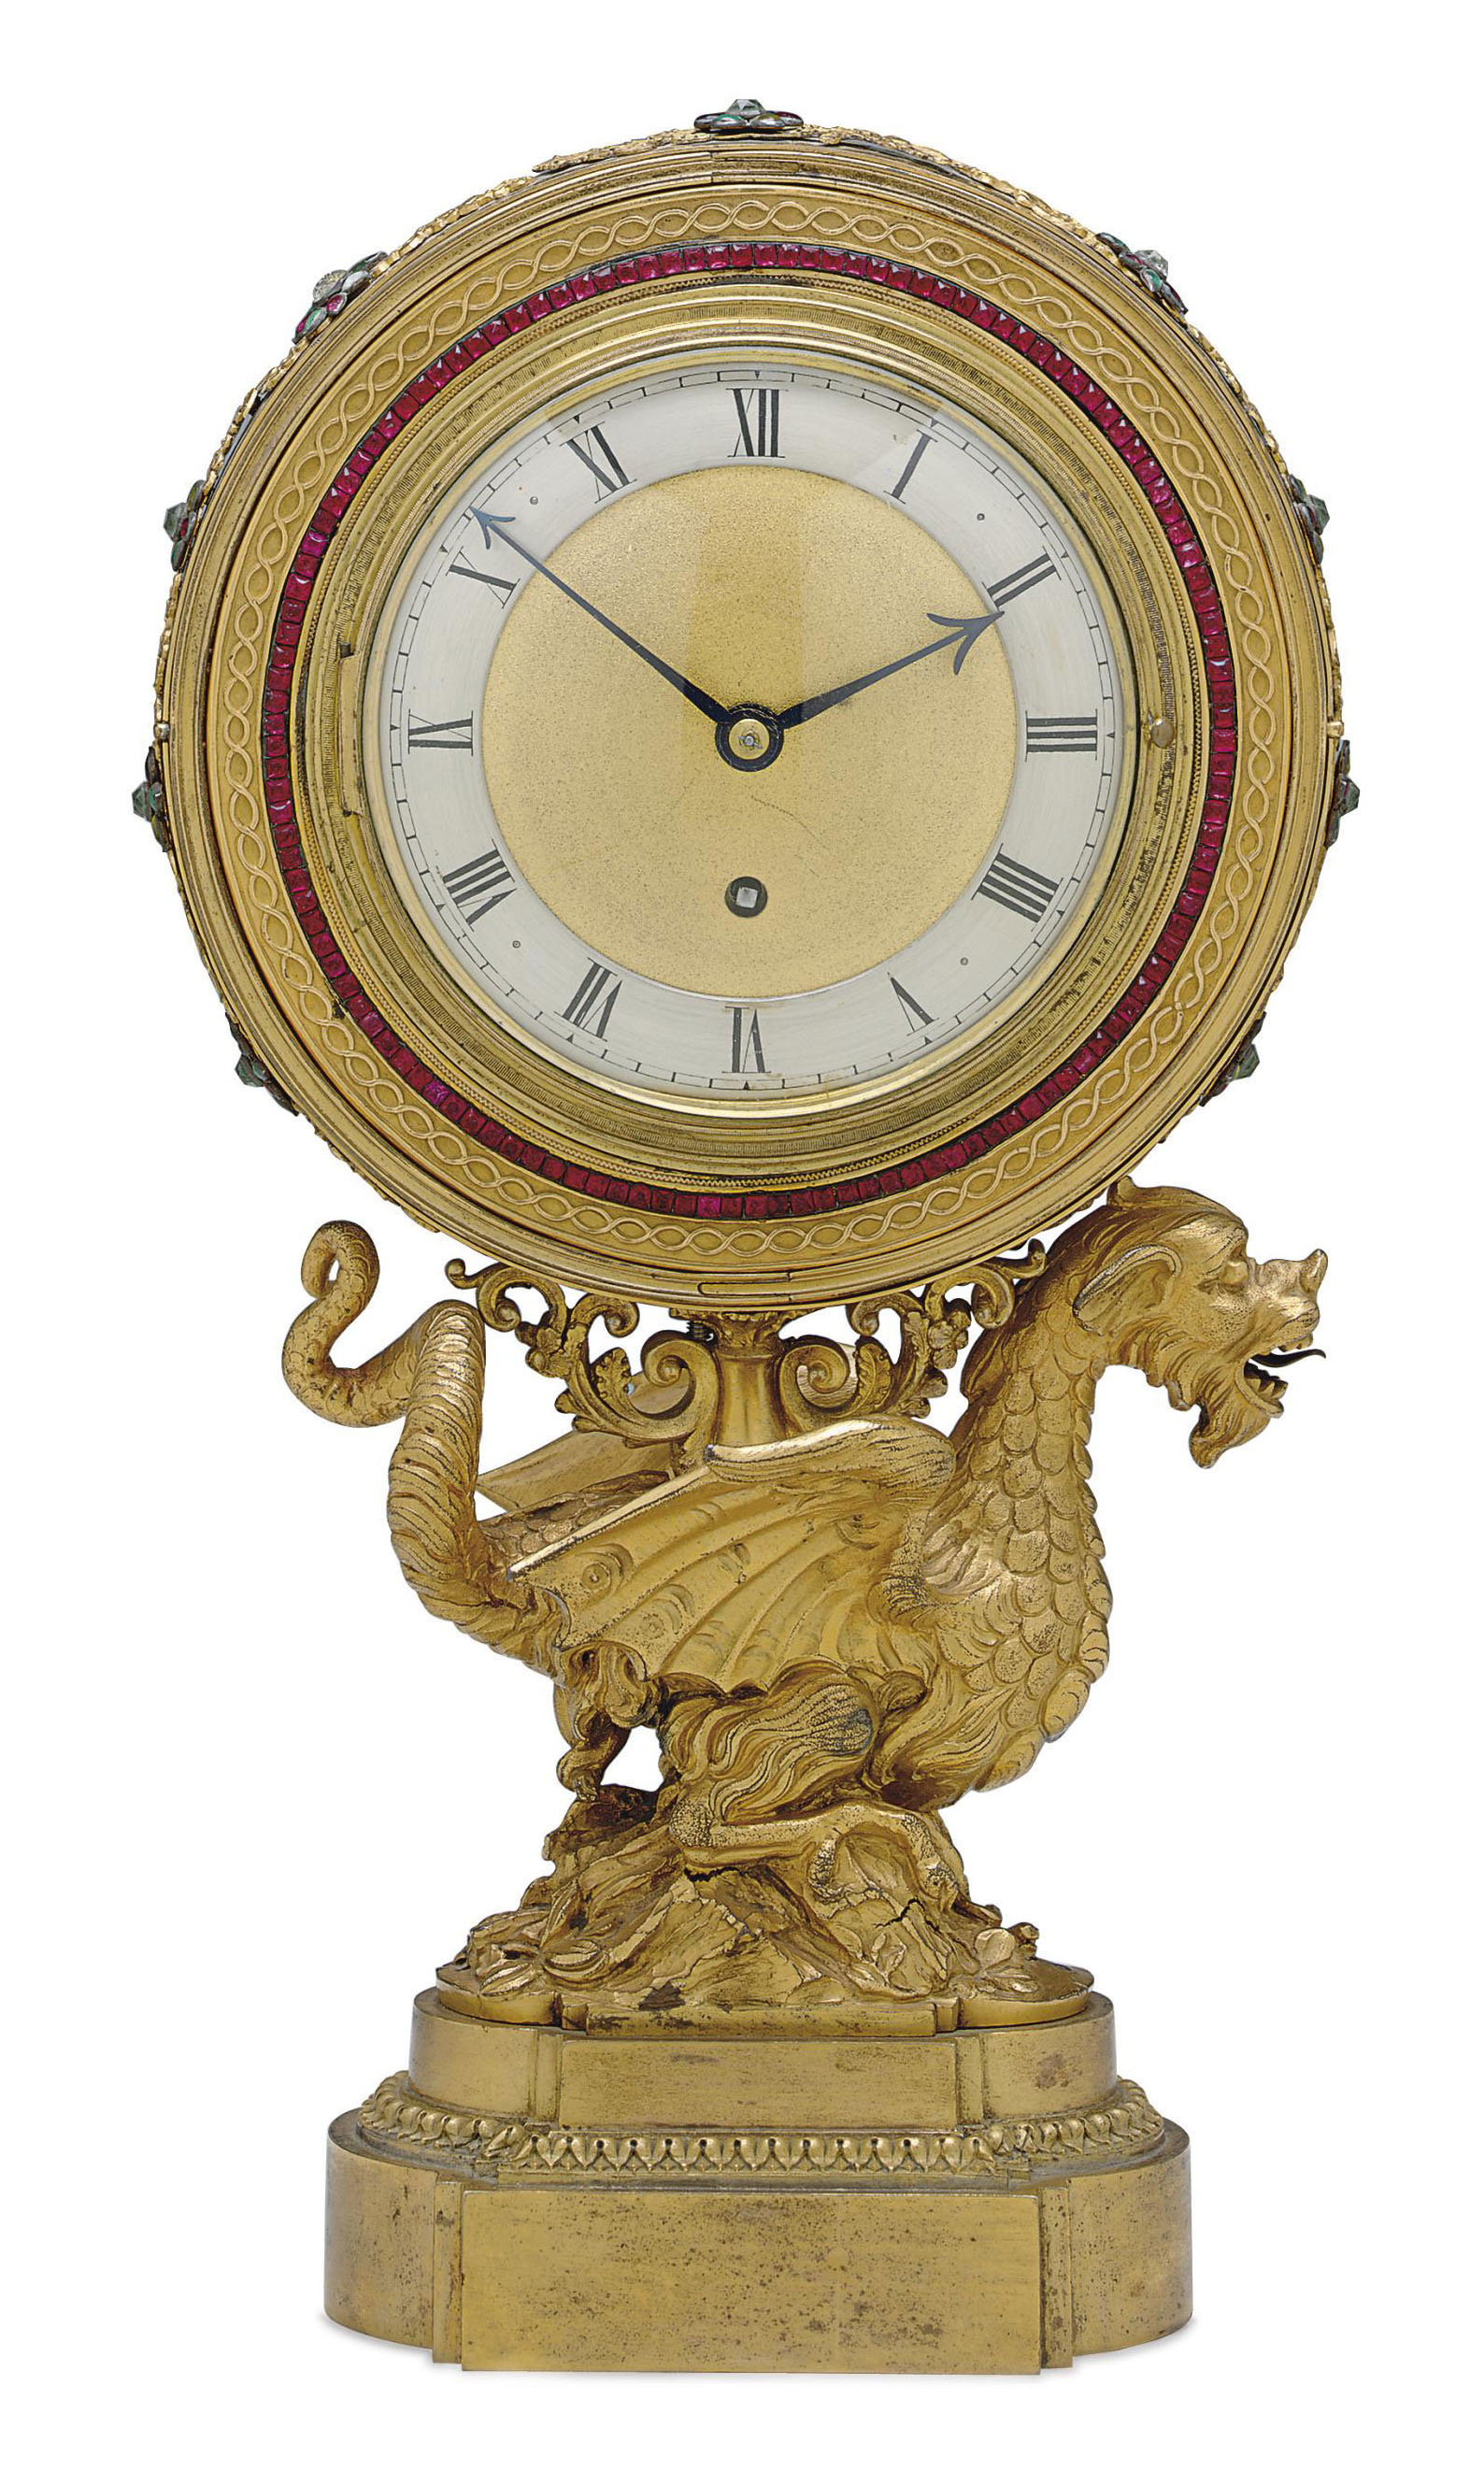 A GEORGE IV ORMOLU AND JEWELED-PASTE TIME-PIECE